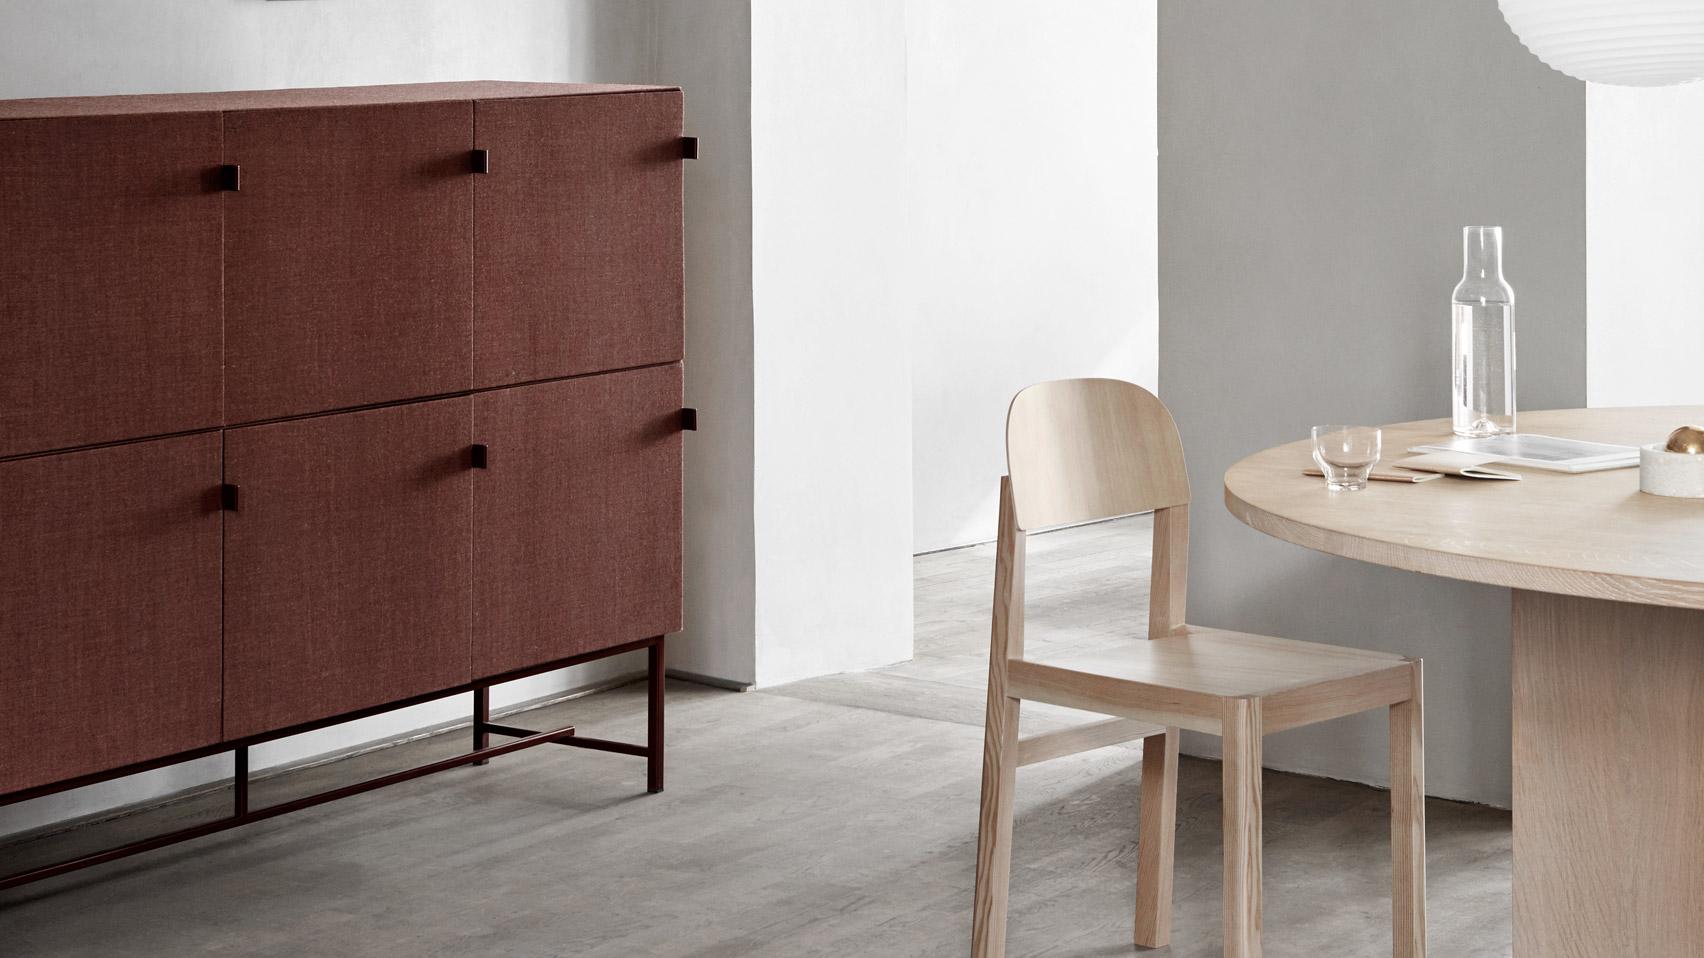 tone-cabinets-norm-architects-zilenzio-design-furniture-cabinets_dezeen_hero